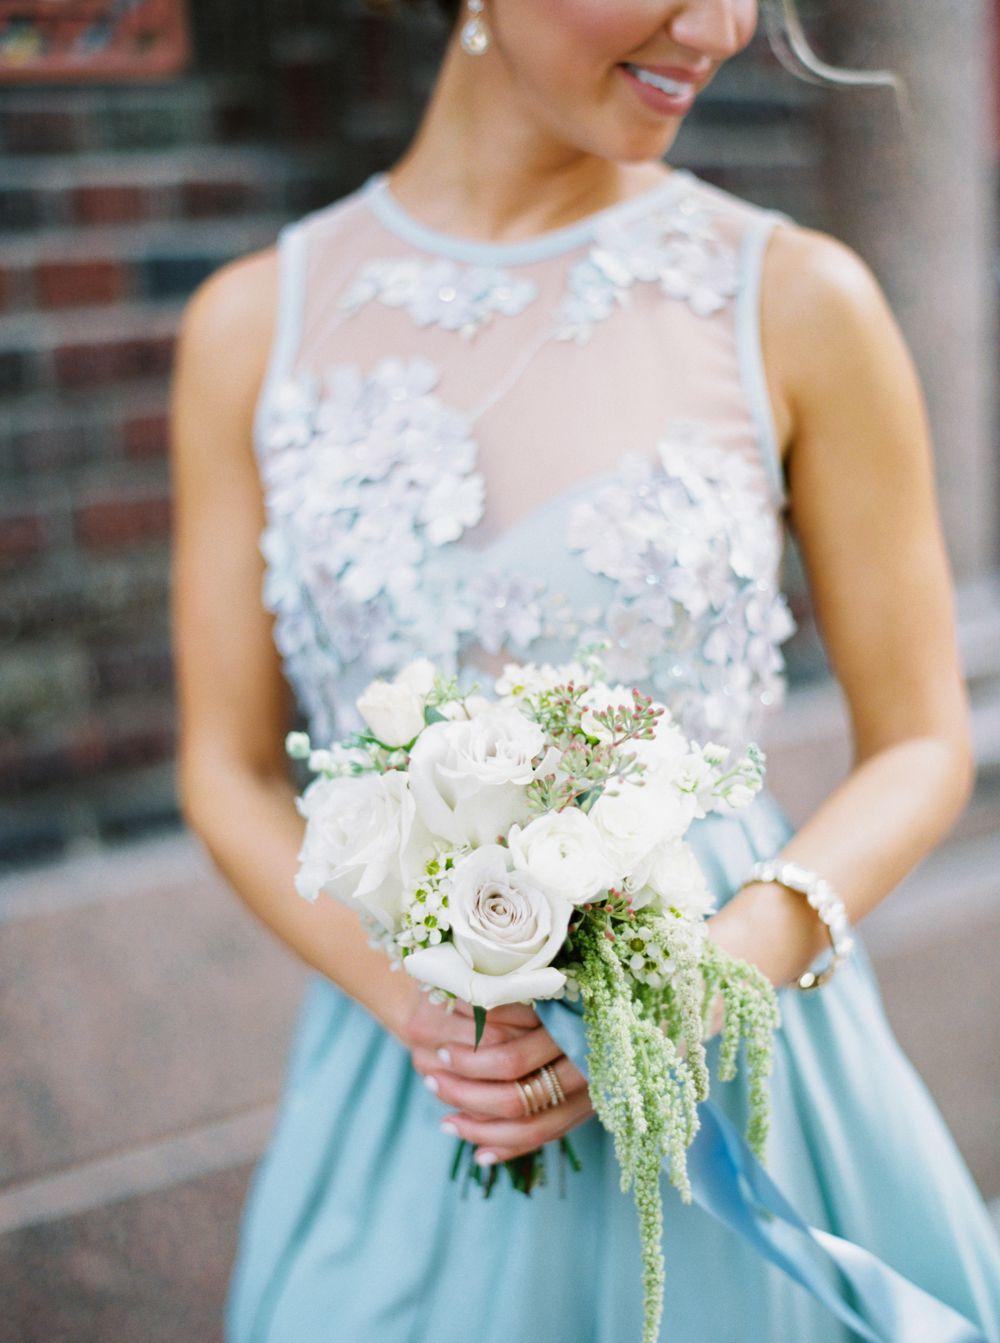 <p>Bridesmaid with bouquet</p><br><br>